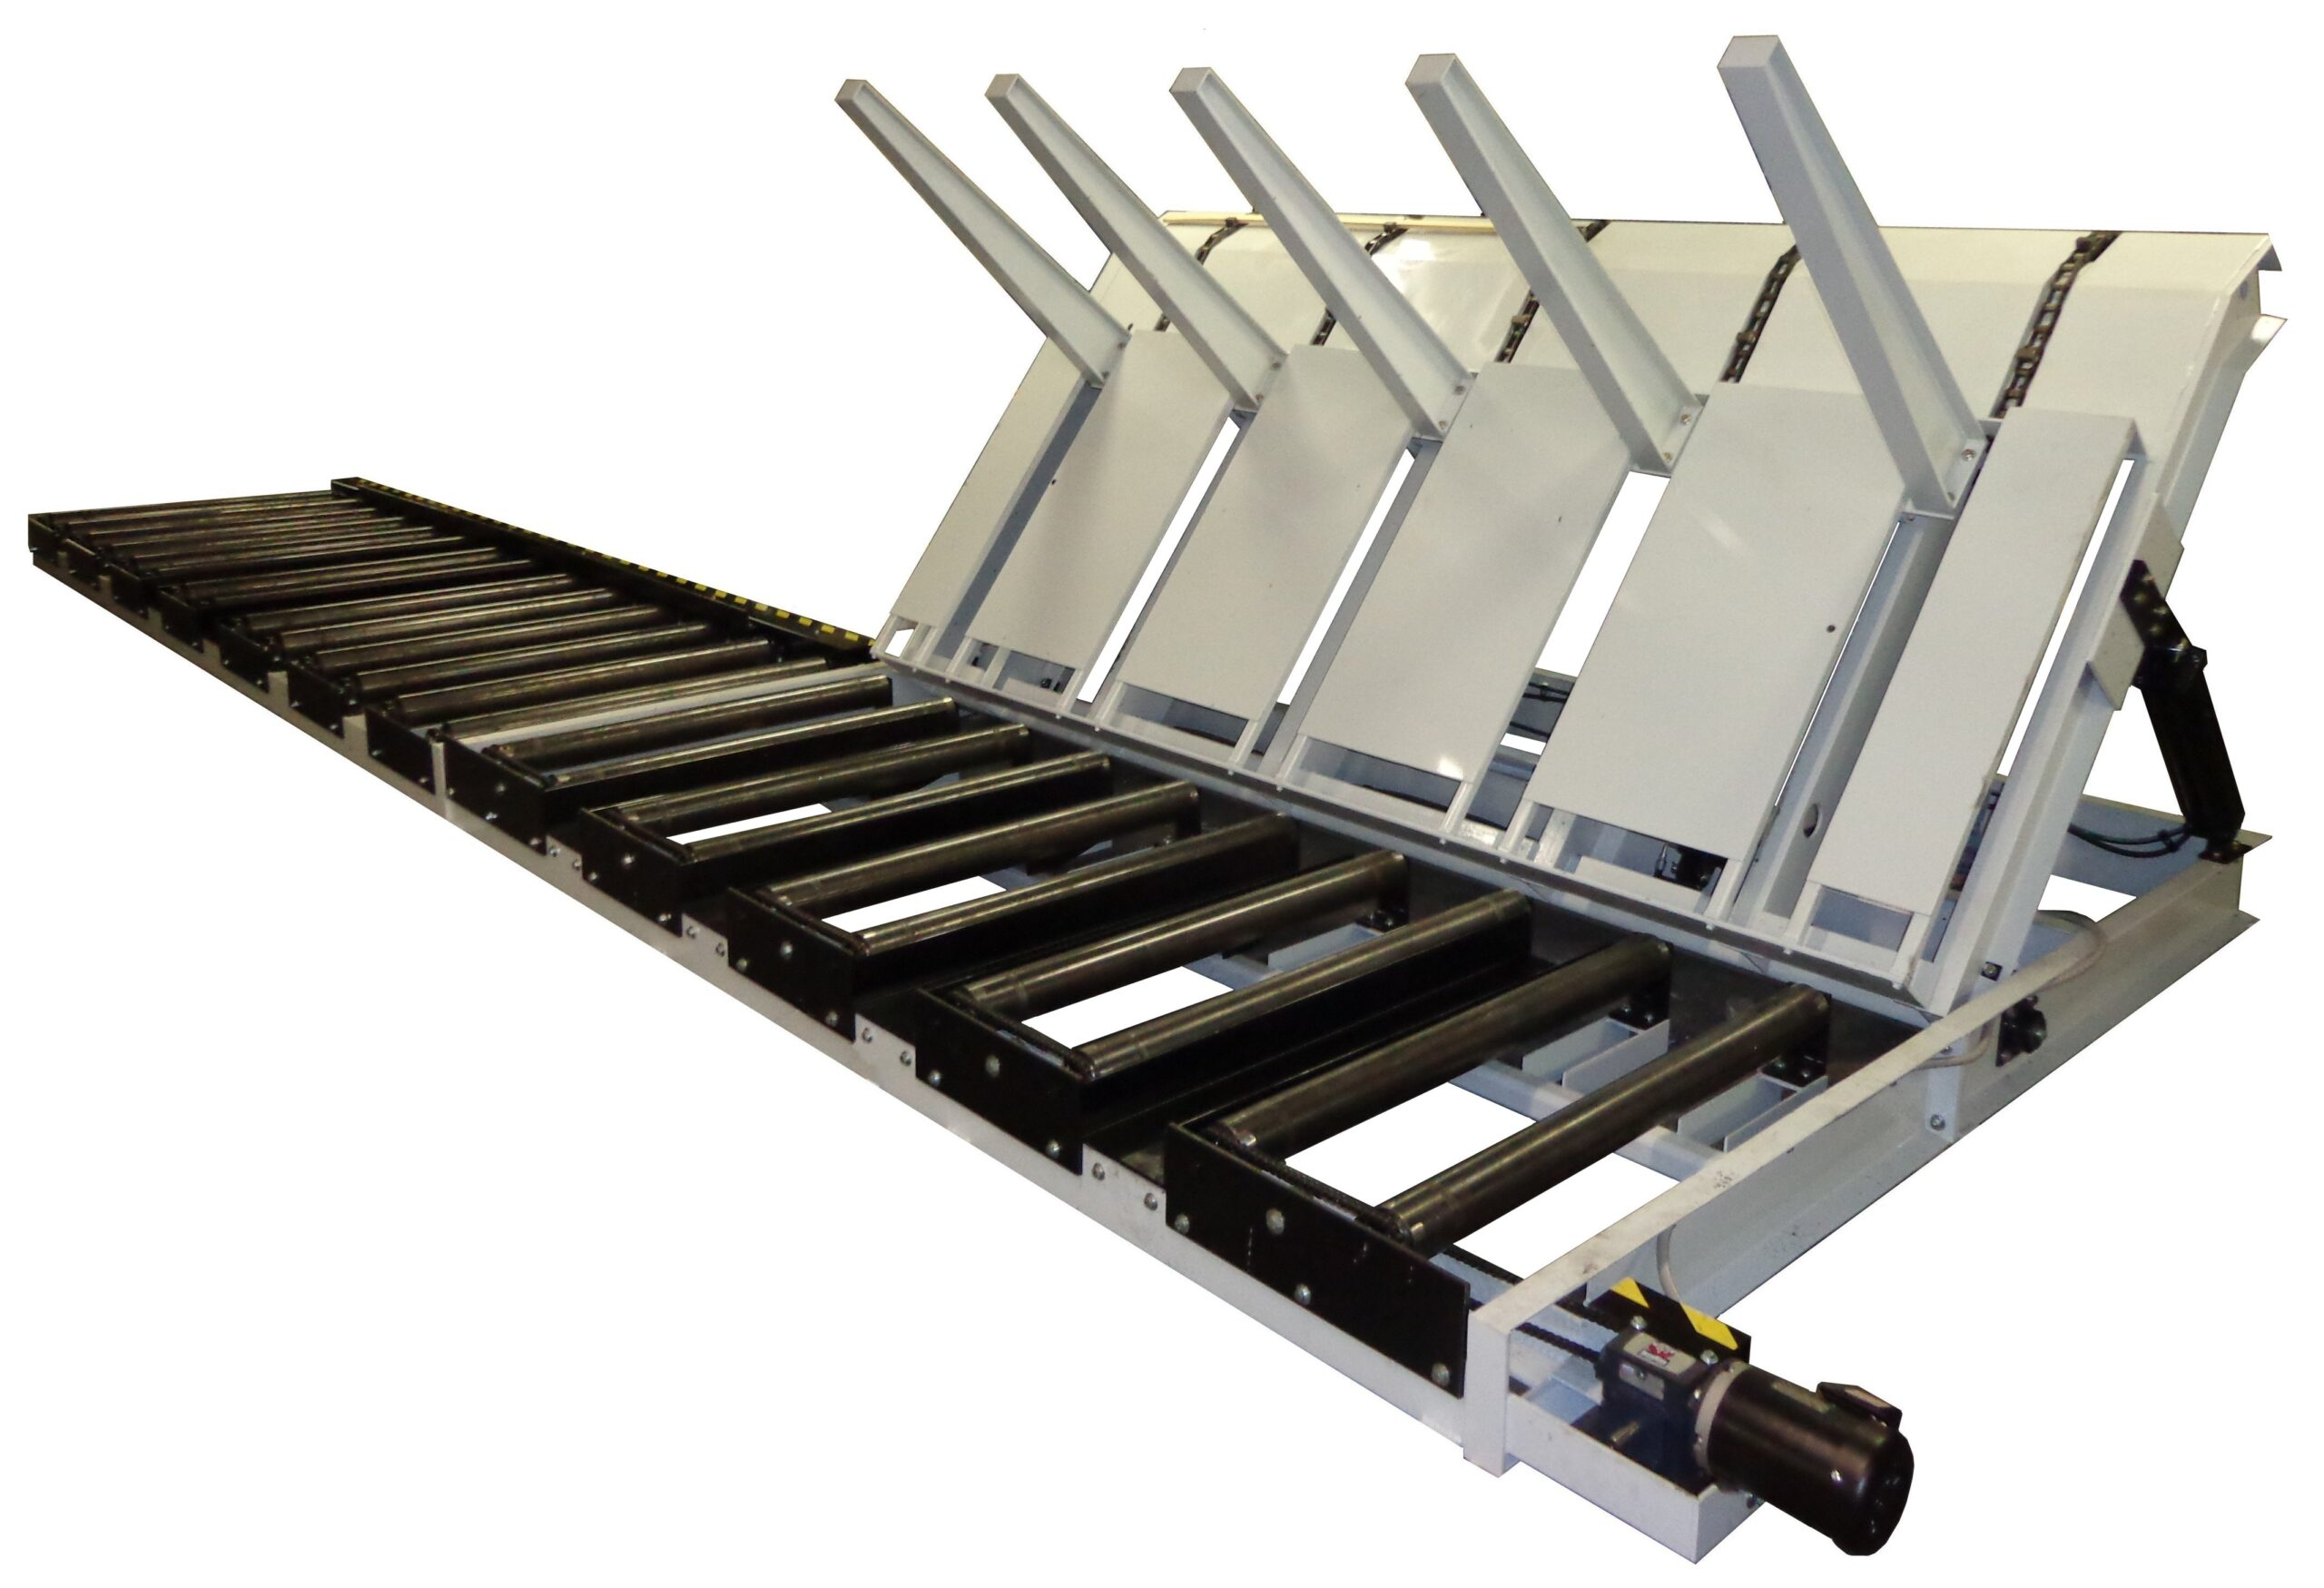 Bundle Dumper with Staging Roller Conveyors